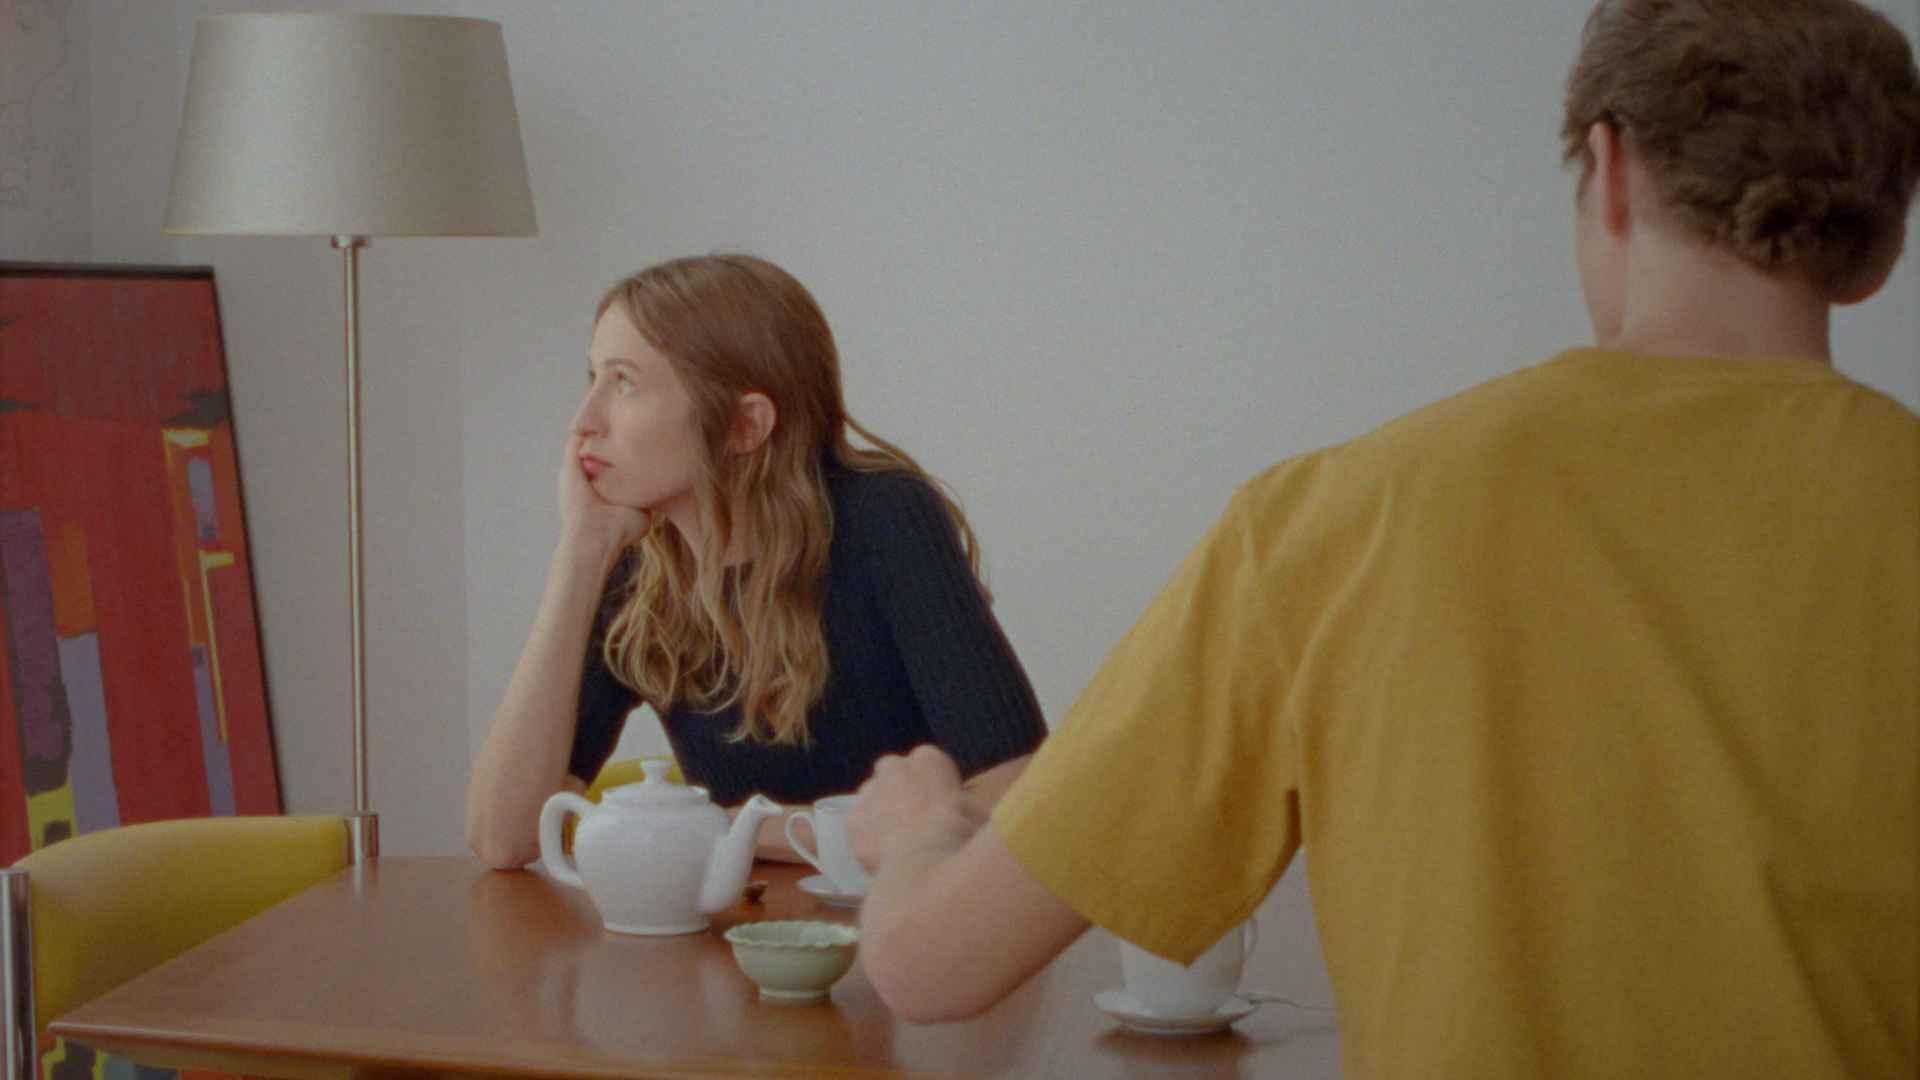 Hermès 'The Forgotten Bag' Summer 2020 Ad Campaign Film